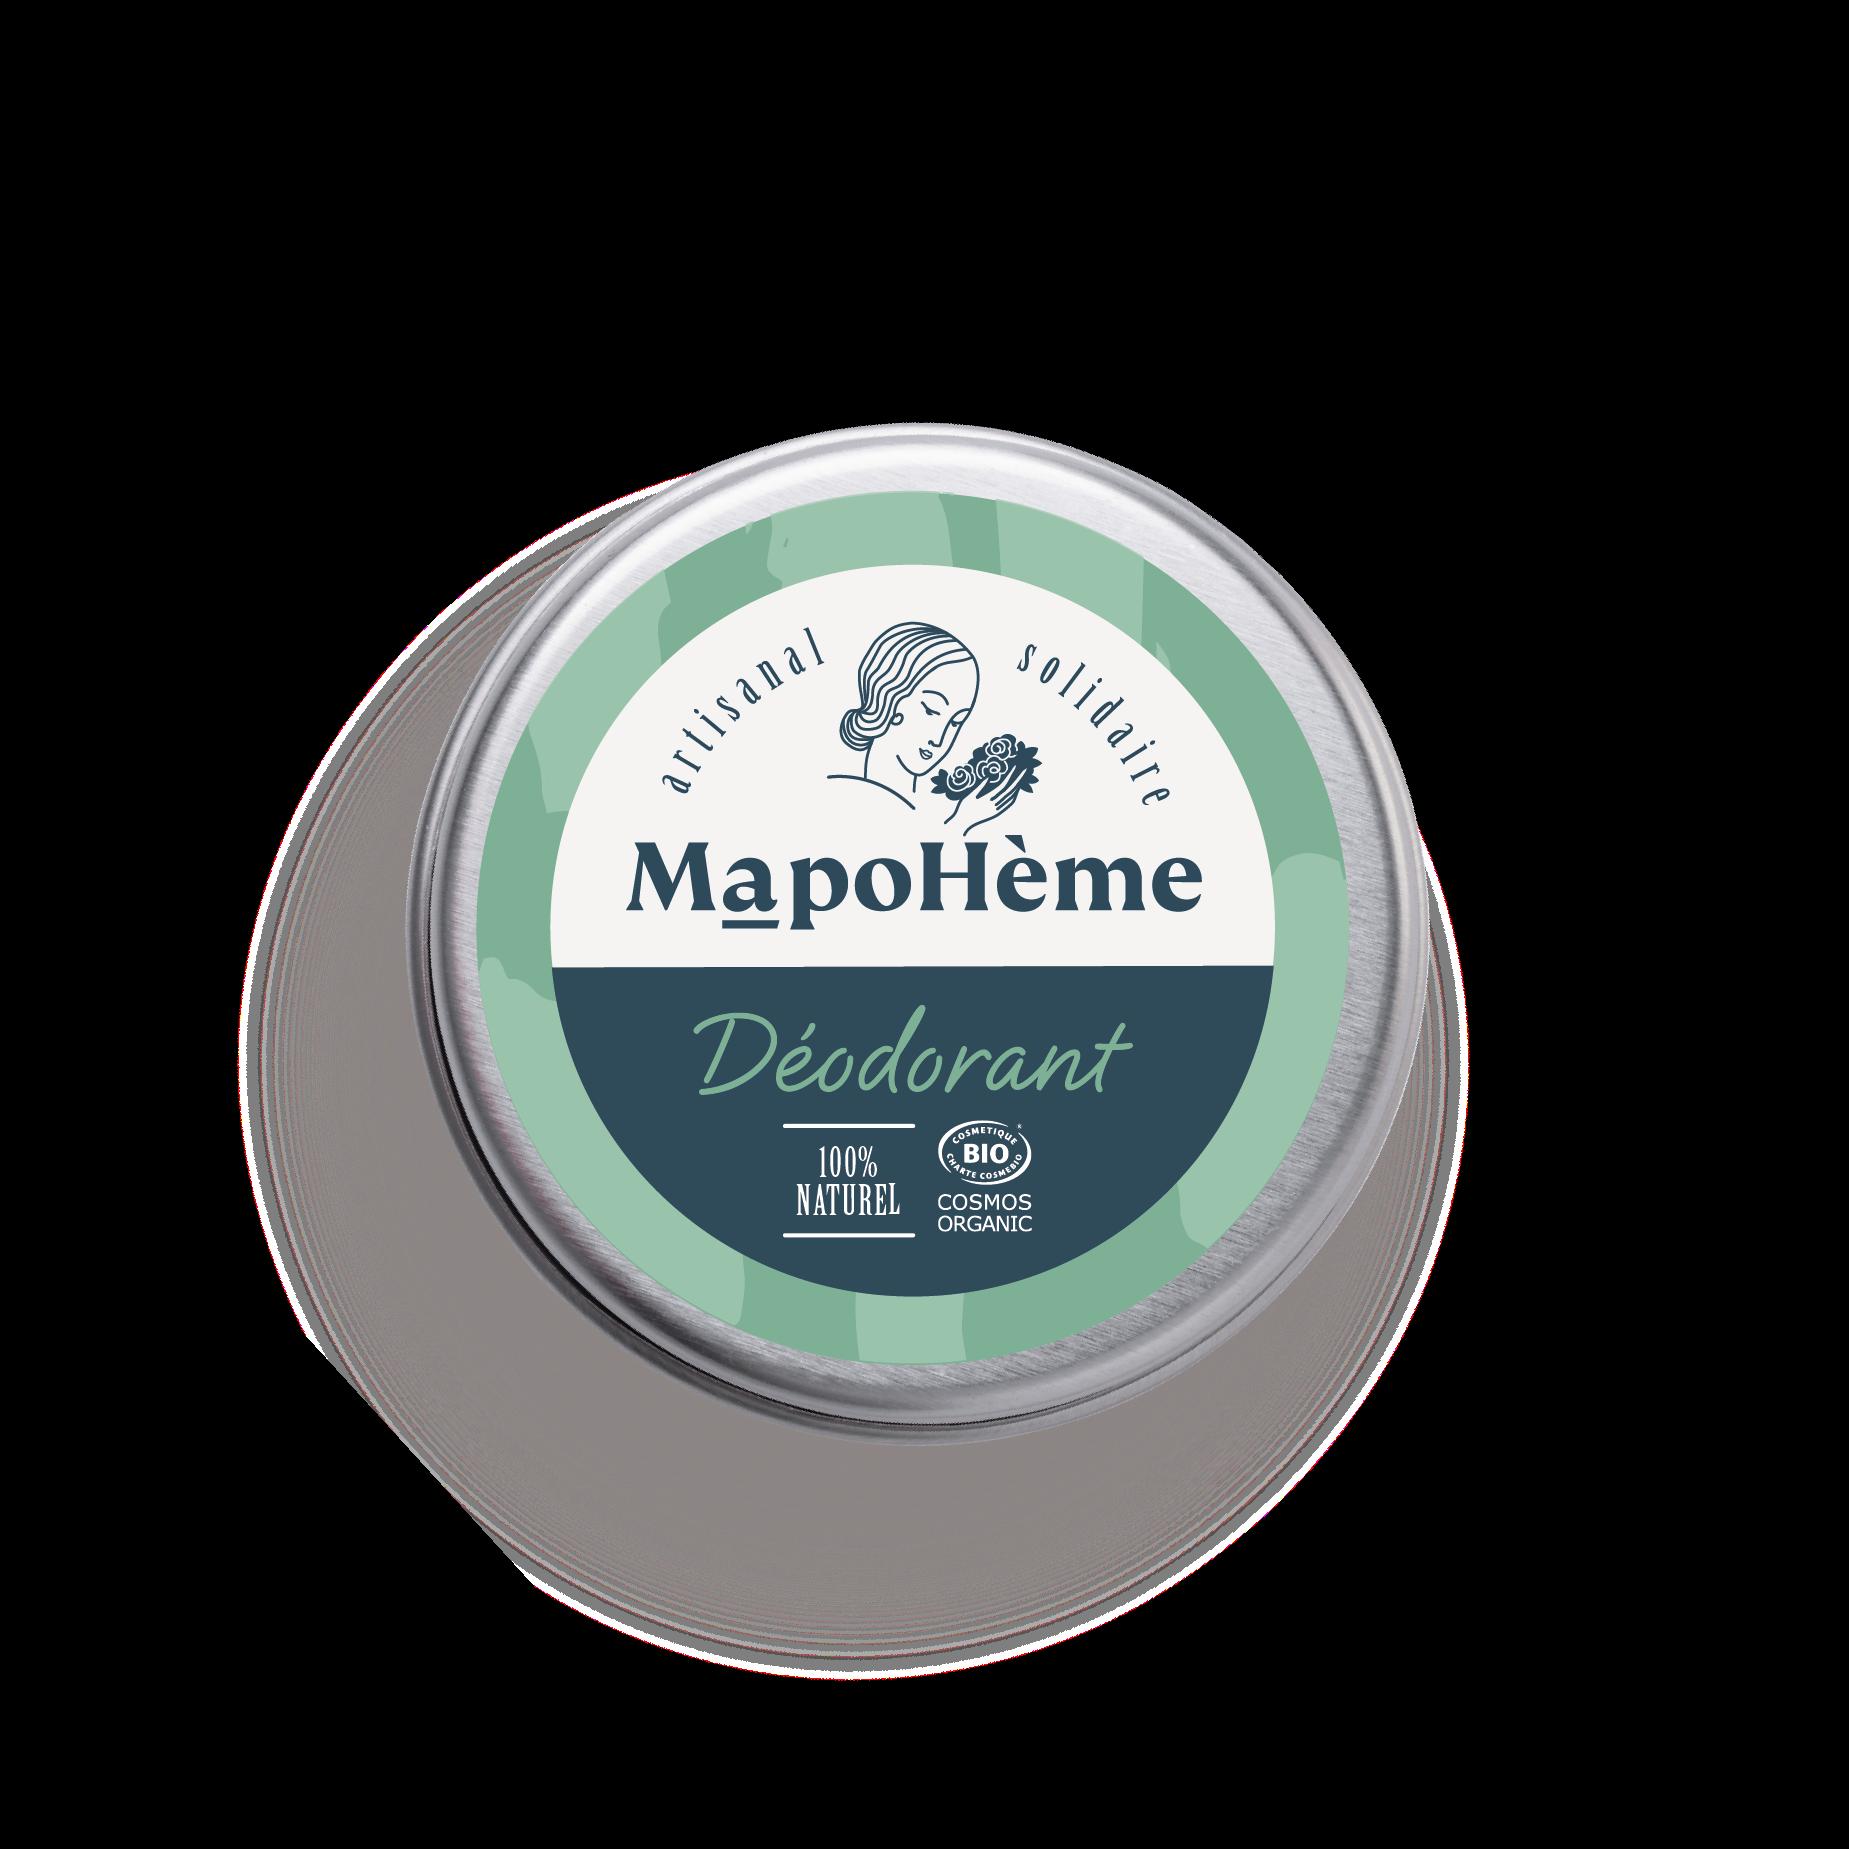 Desodorizante Natural - MapoHème